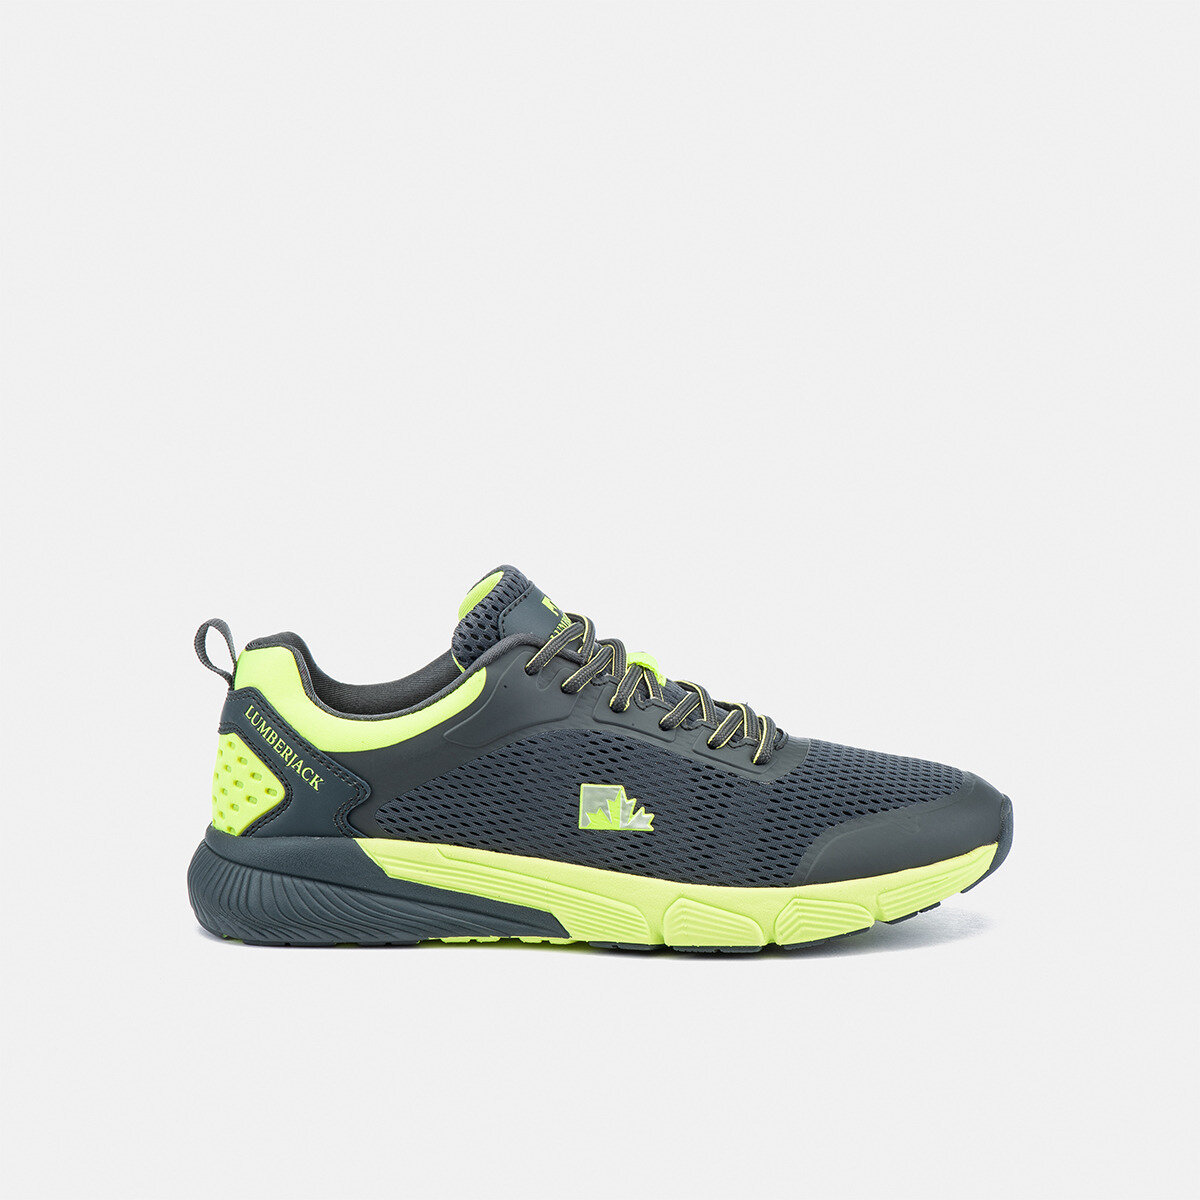 CHEN DK GREY/LIME Man Running shoes